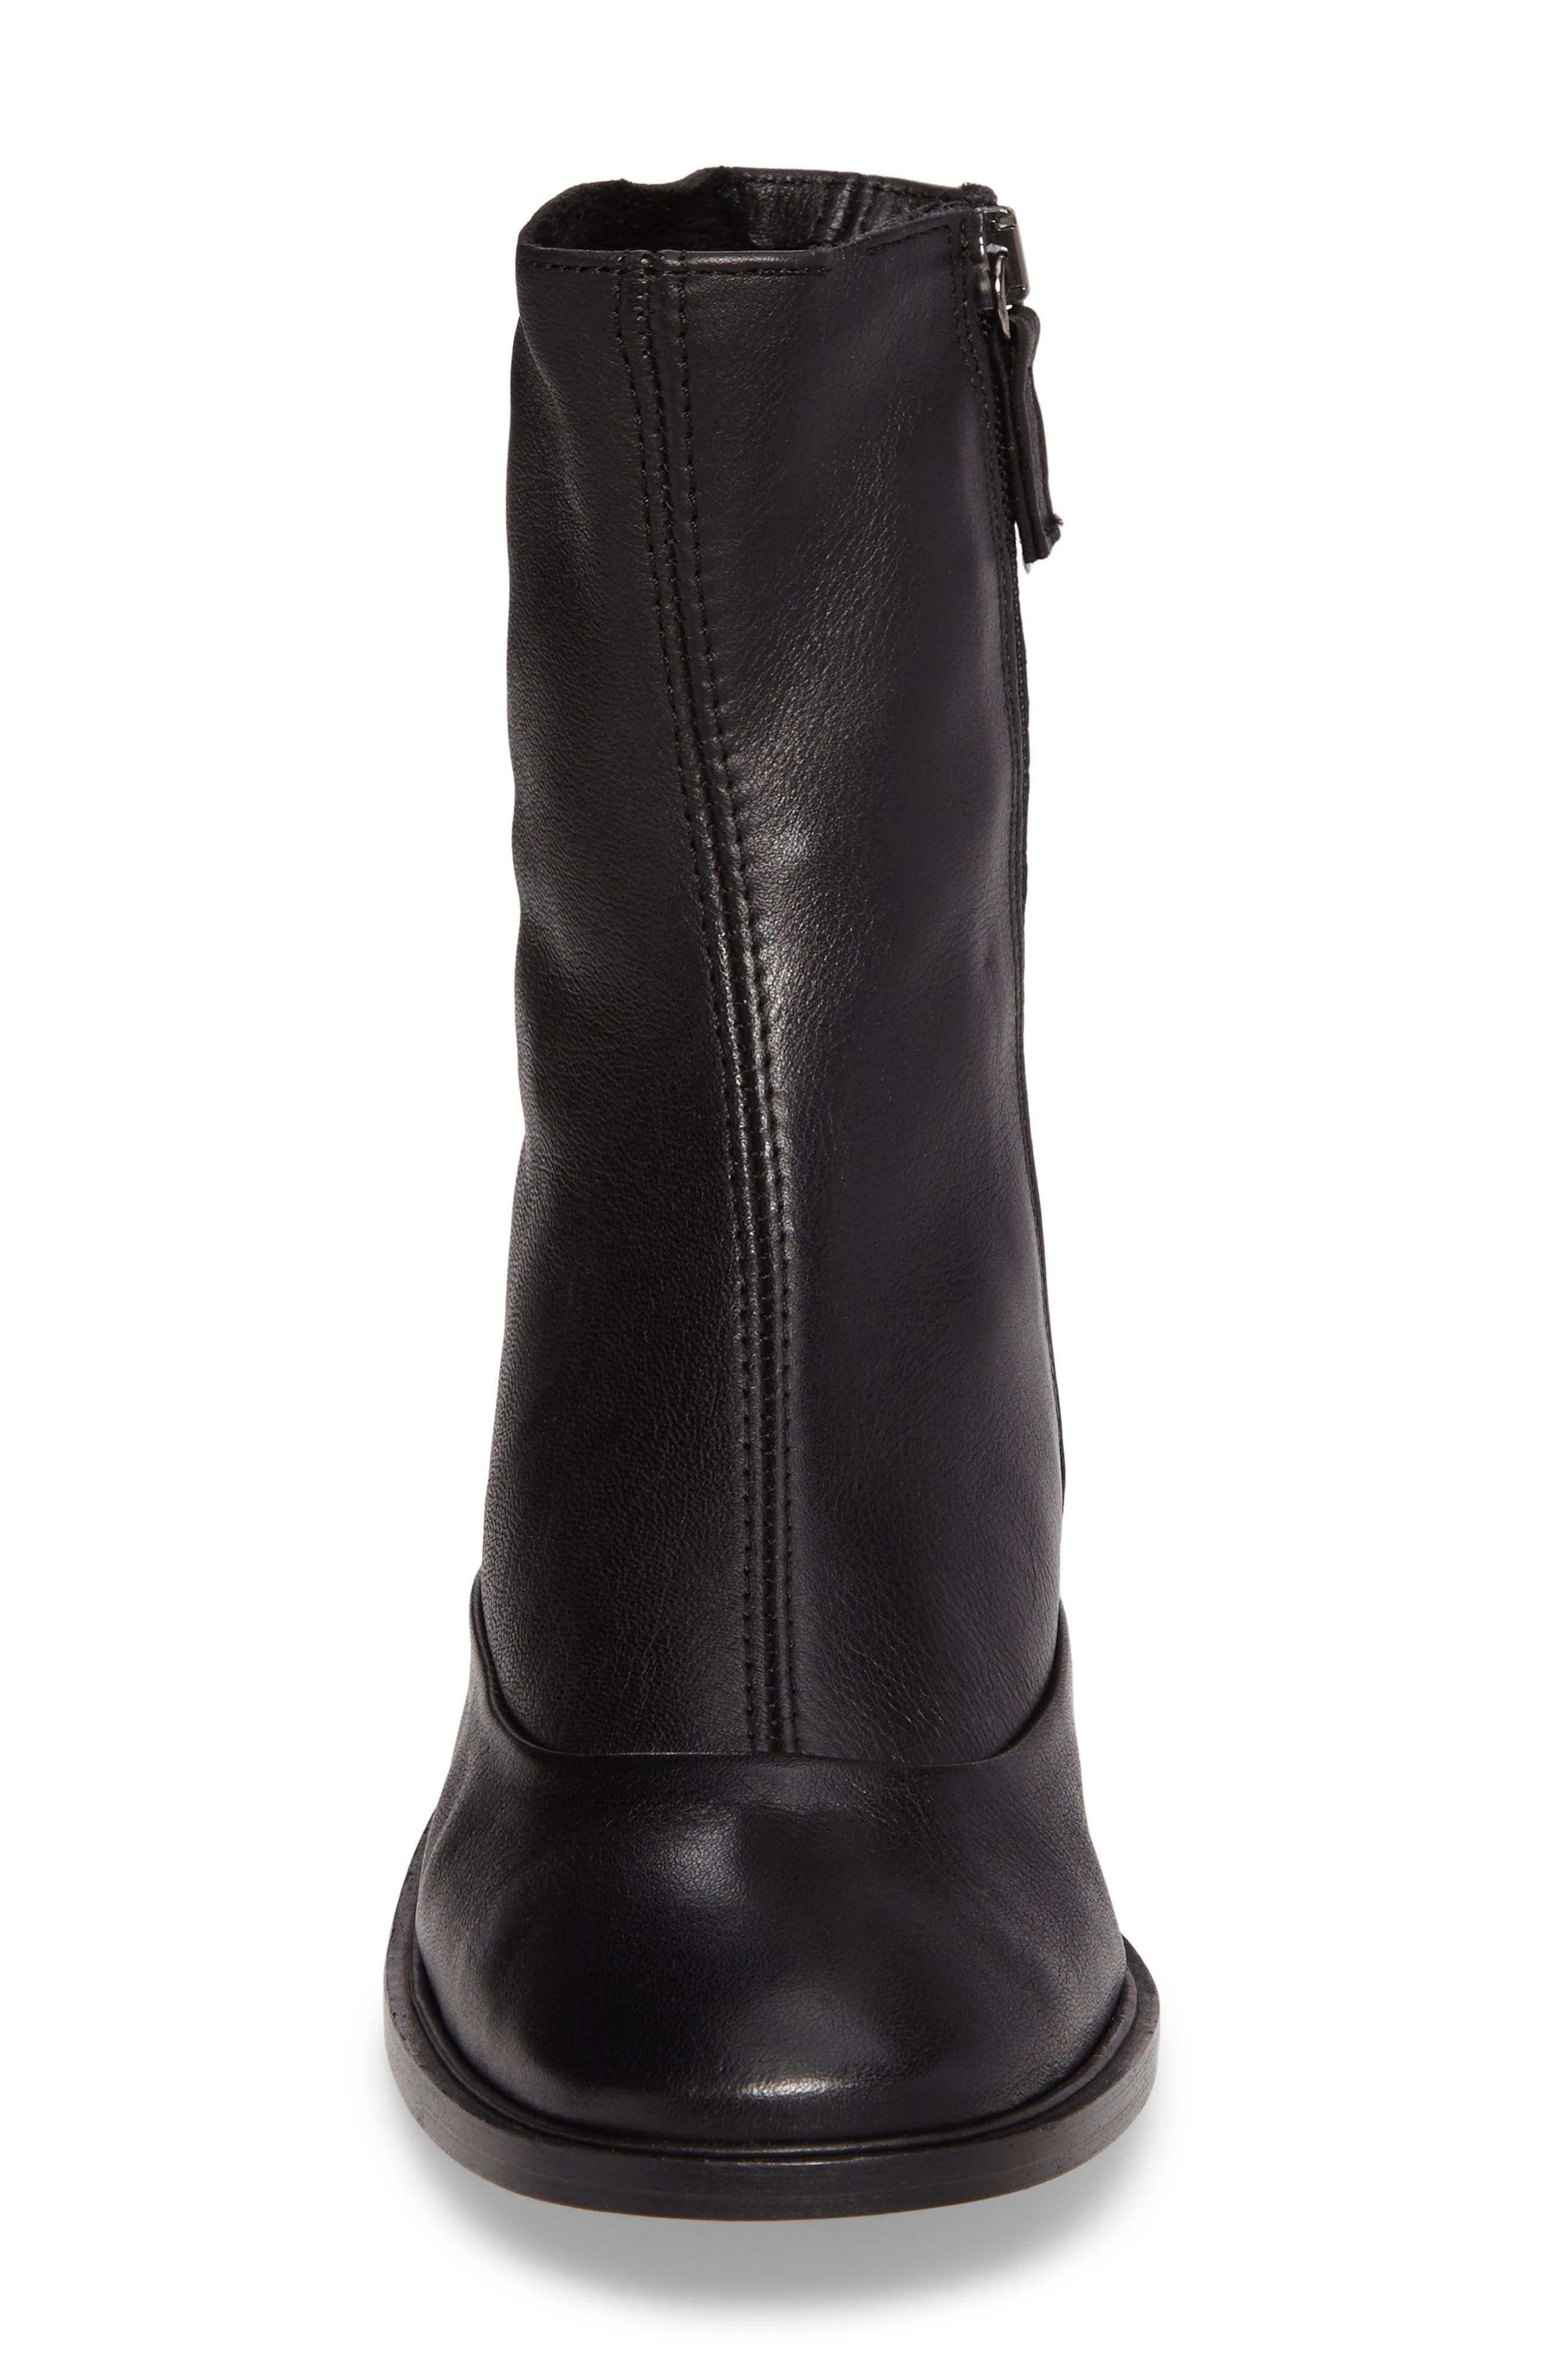 April Sock Boots,                             Alternate thumbnail 4, color,                             001